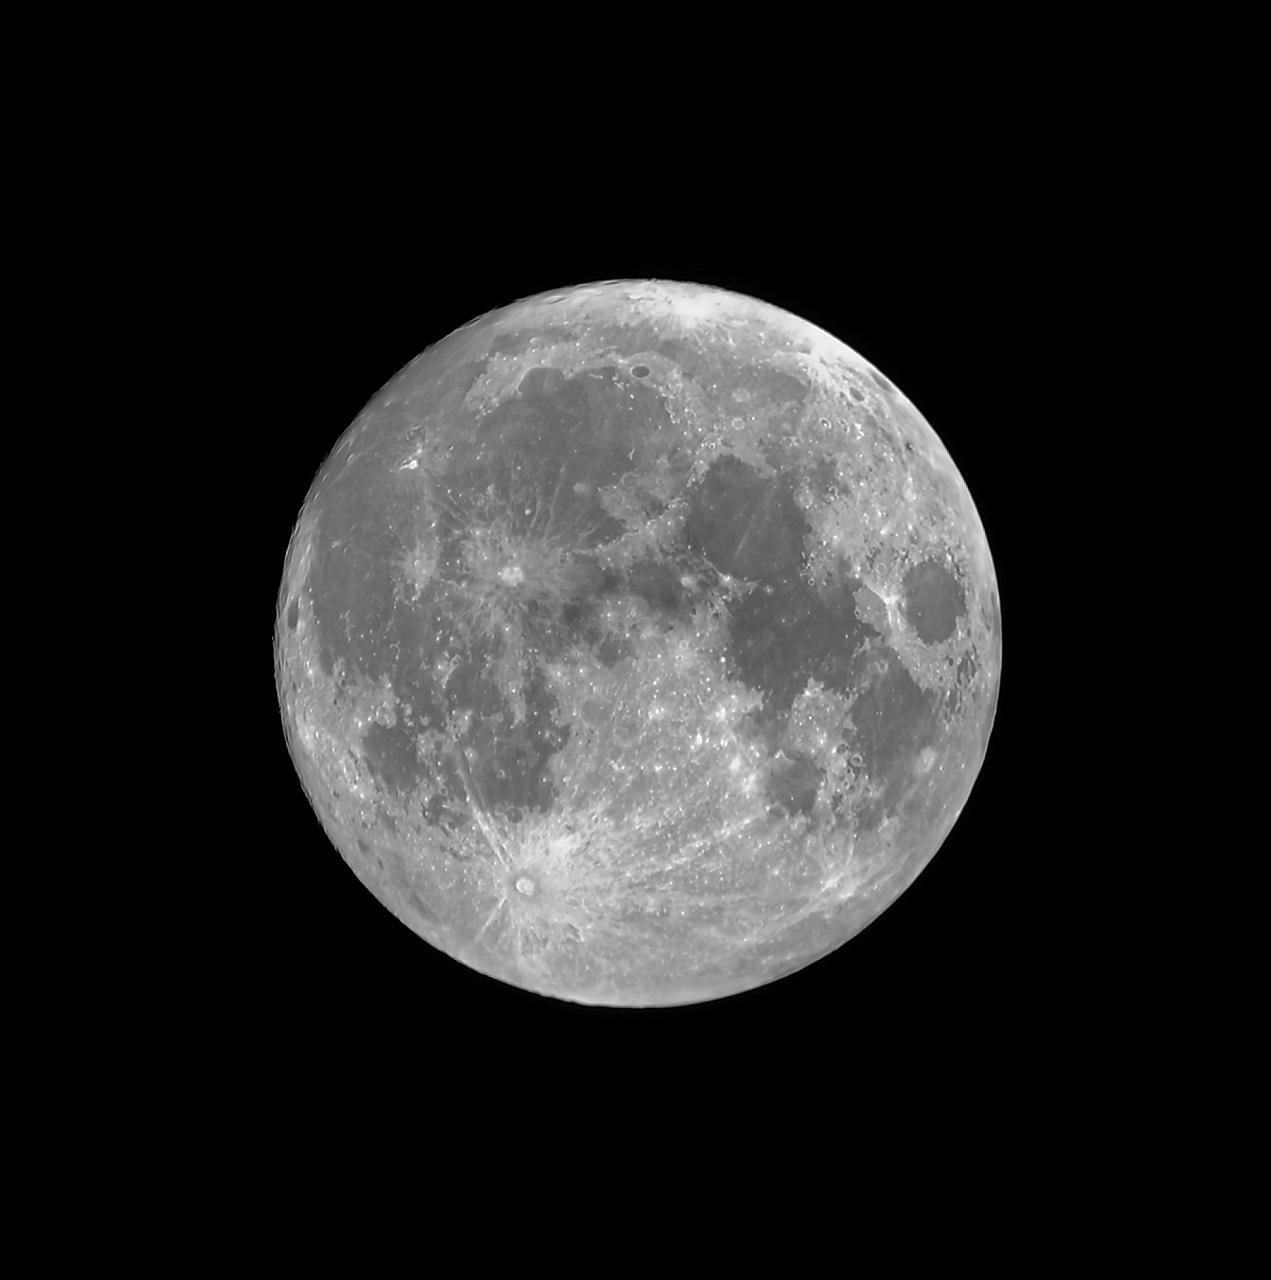 Moon_1.5.jpg.867f6e7fb1db016006c834c75d40b31a.jpg